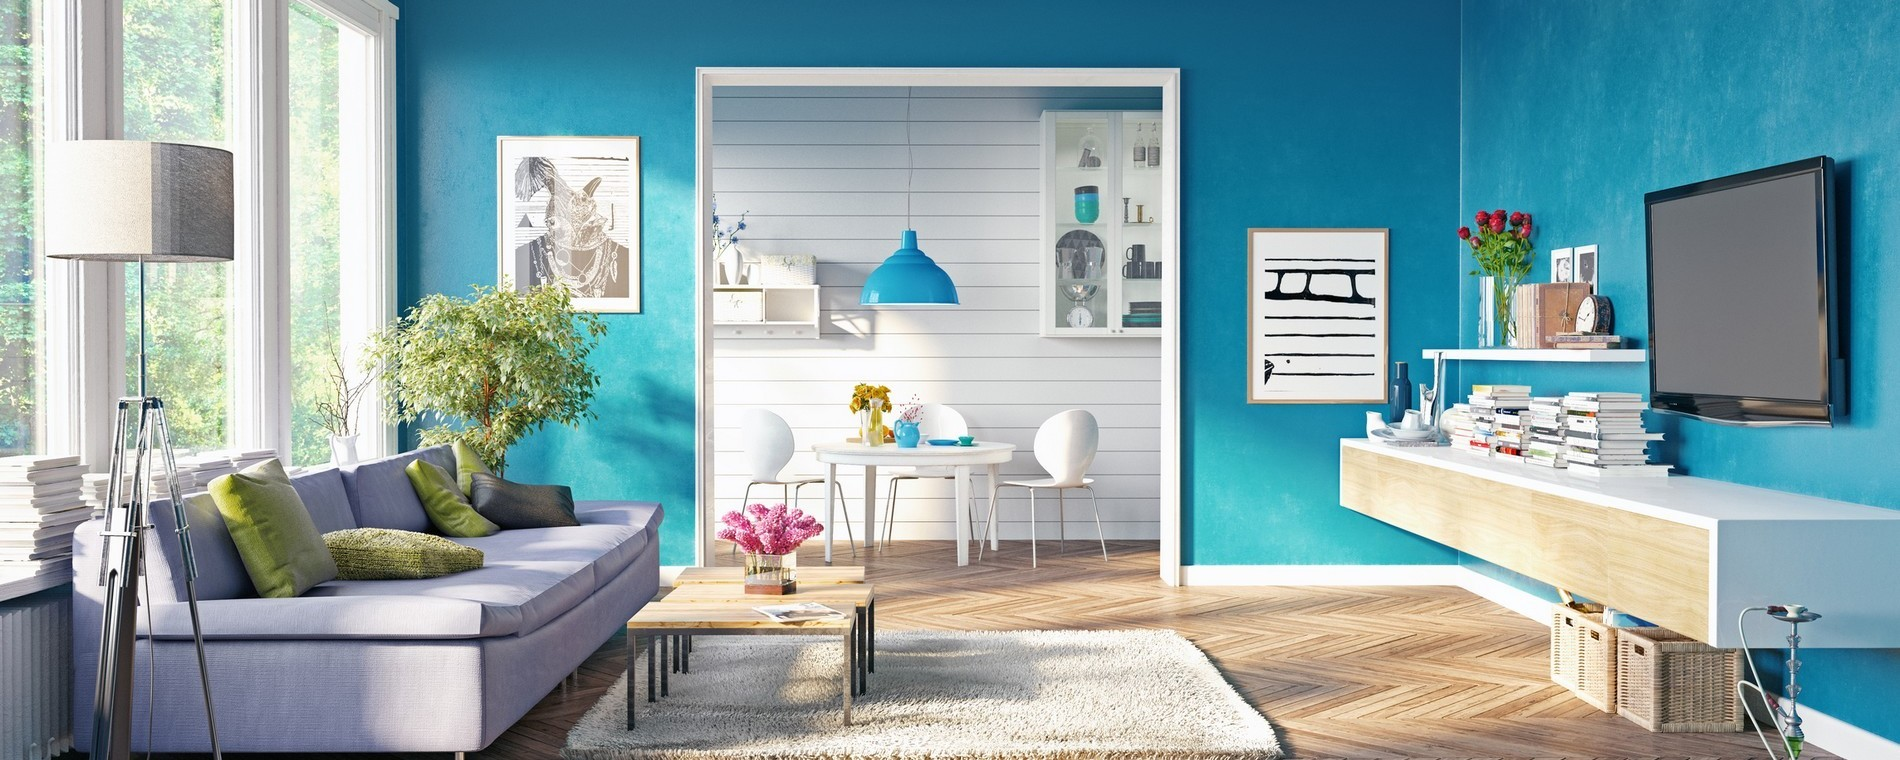 comment estimer sa maison gallery of estimation maison par notaire with comment estimer sa. Black Bedroom Furniture Sets. Home Design Ideas